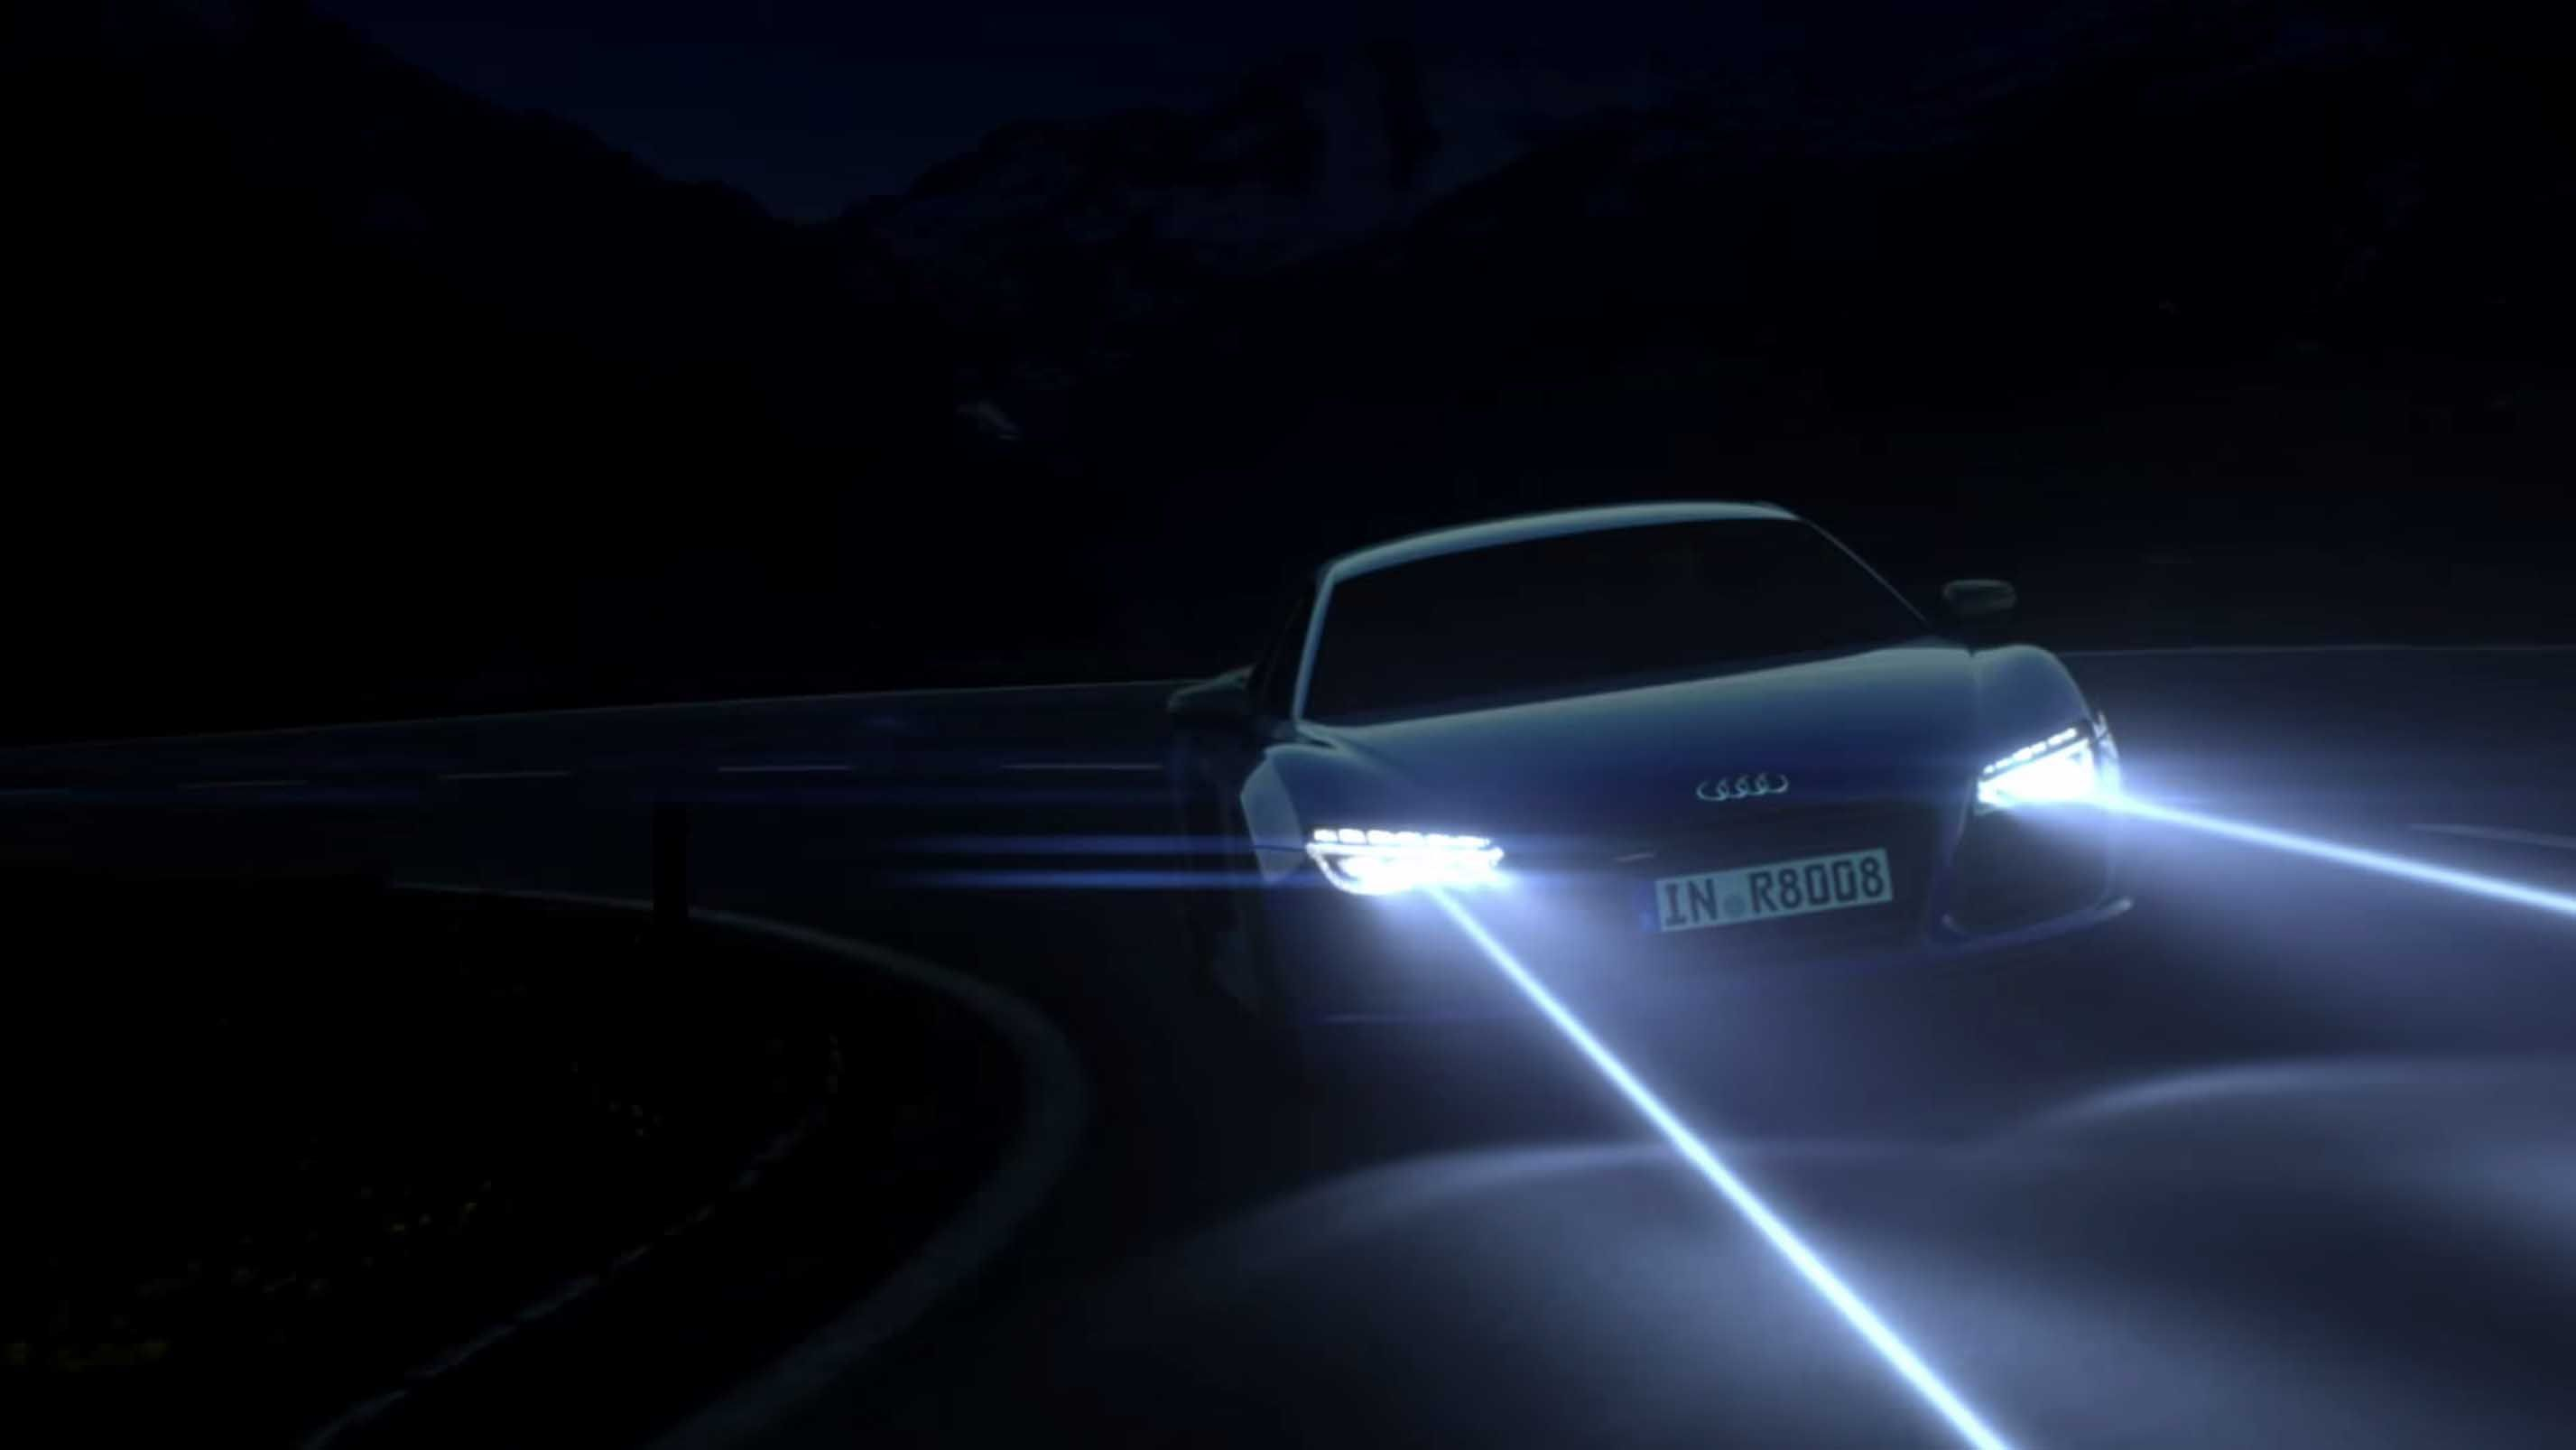 10+ Nice Audi R8 LMX Laser Headlight Images | Audi | Pinterest